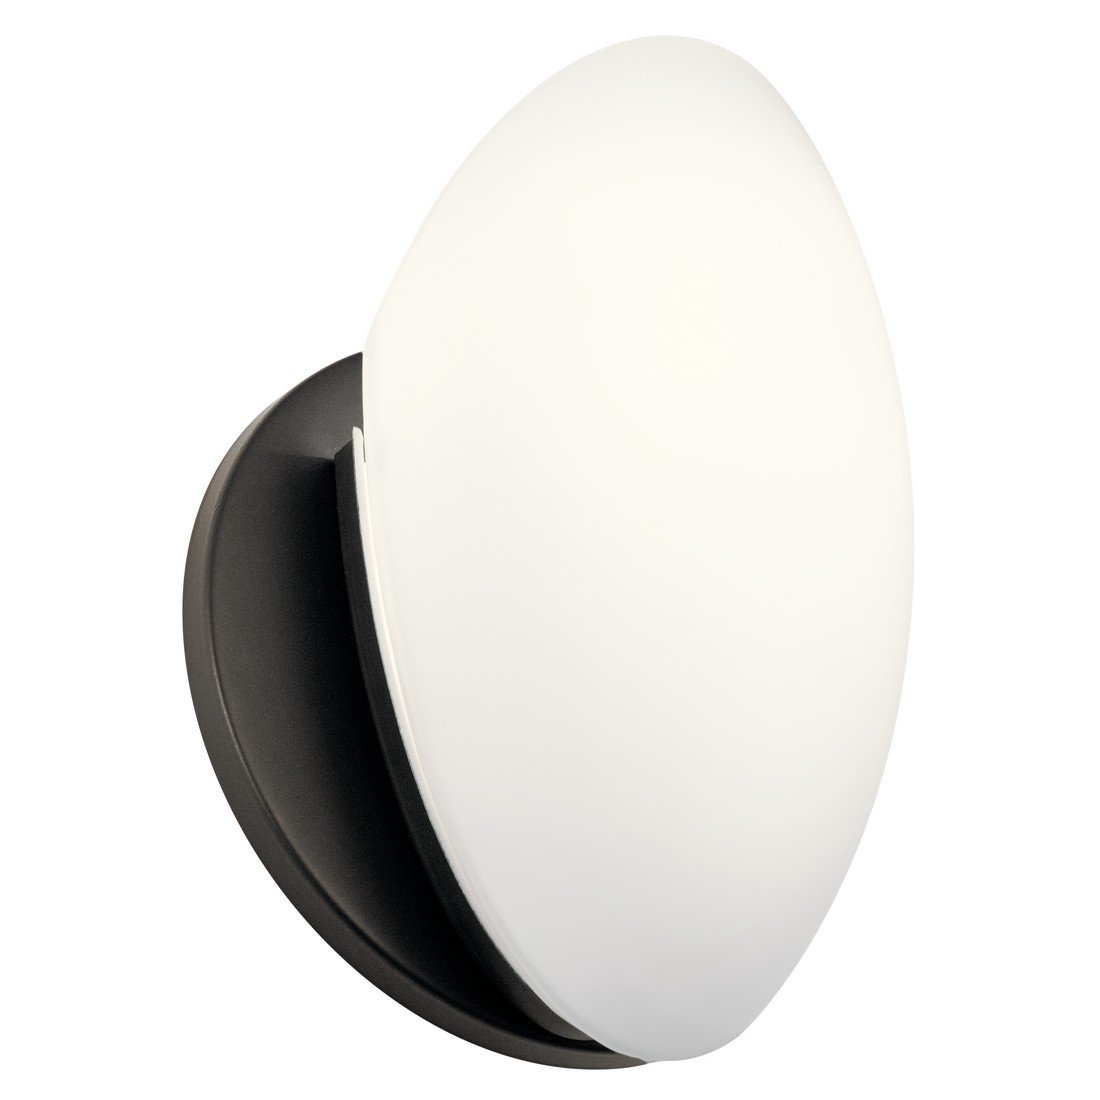 Kichler 6520OZ One Light Wall Sconce